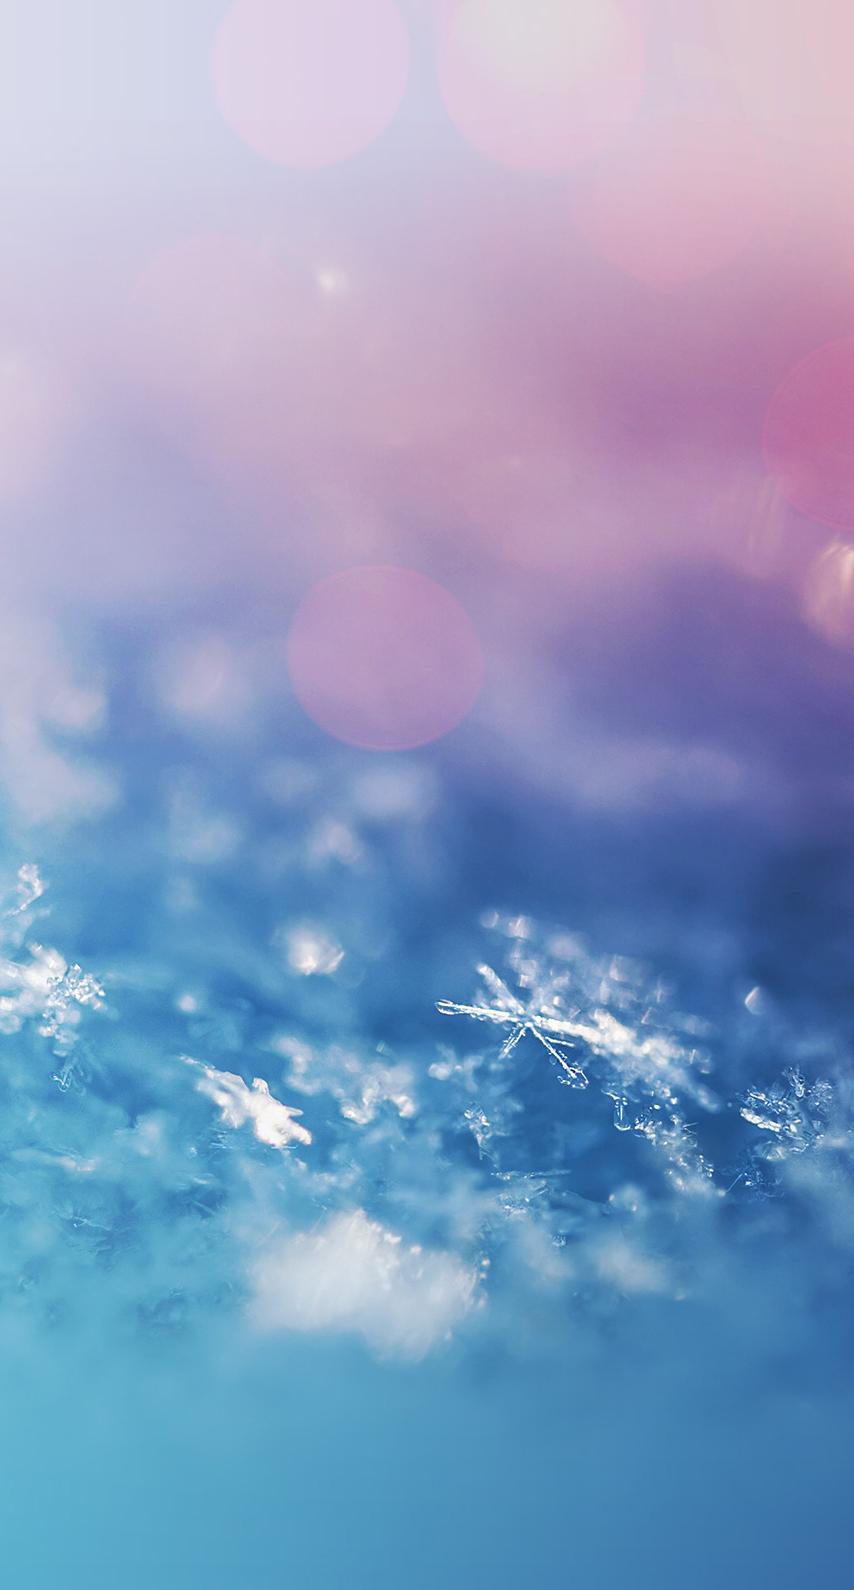 graphic, air, sun, insubstantial, desktop, blur, luminescence, fair weather, cloud, color, weather, season